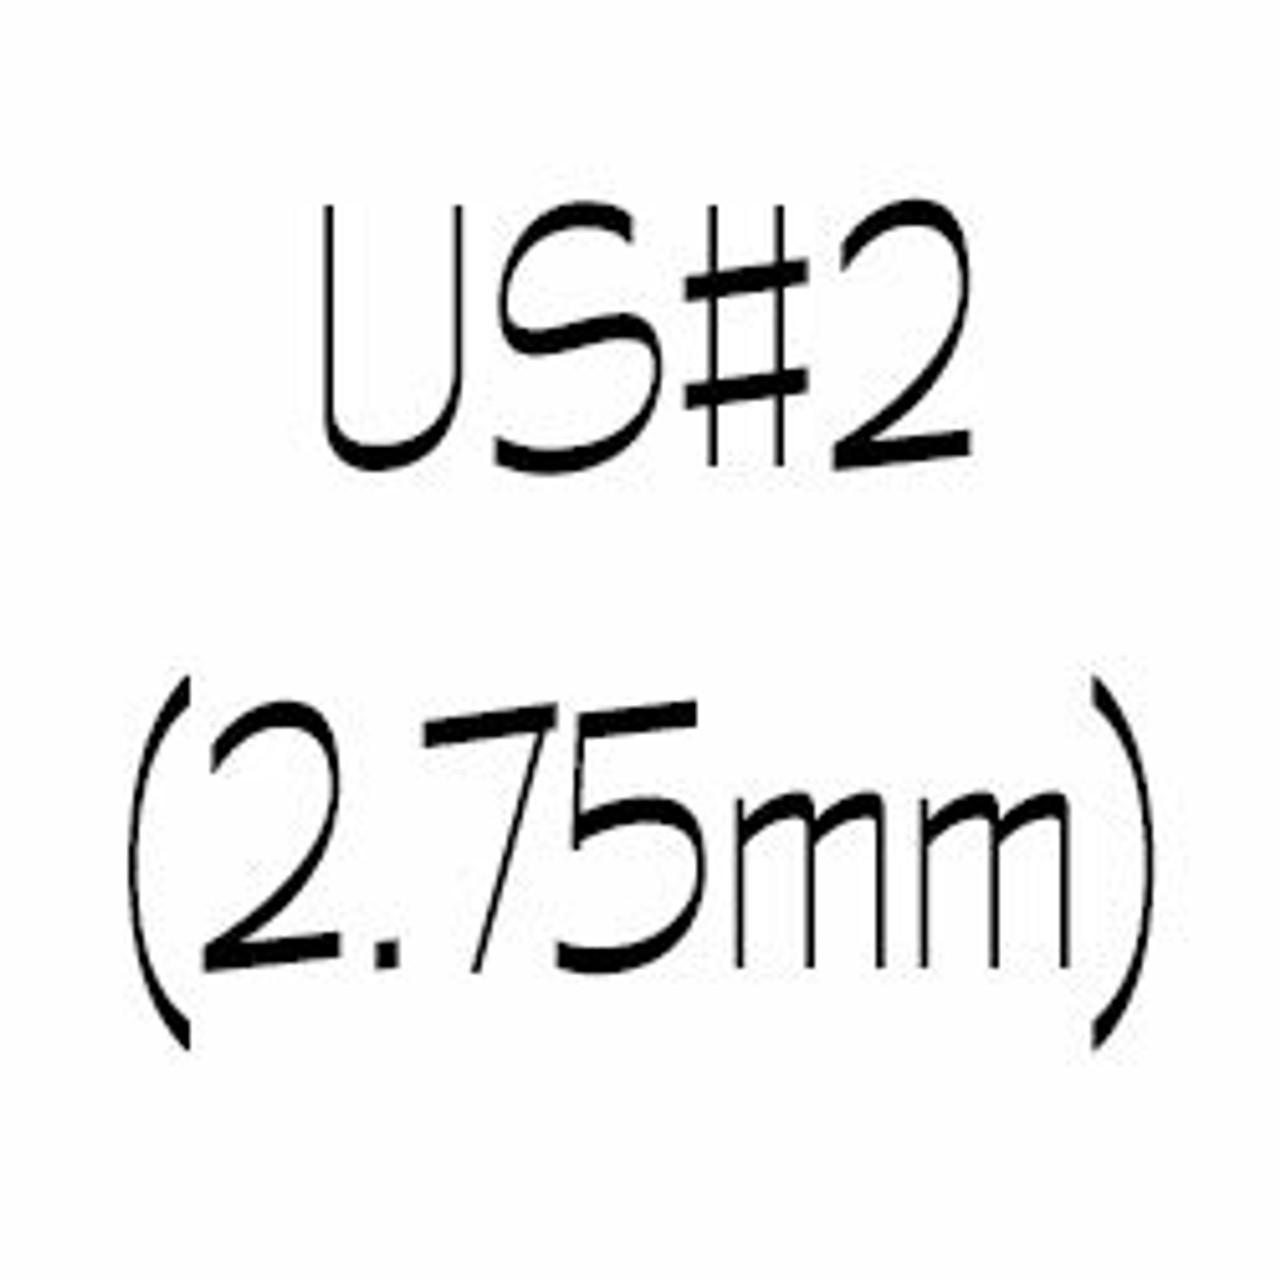 US#2 (2.75mm) Circular Knitting Needles